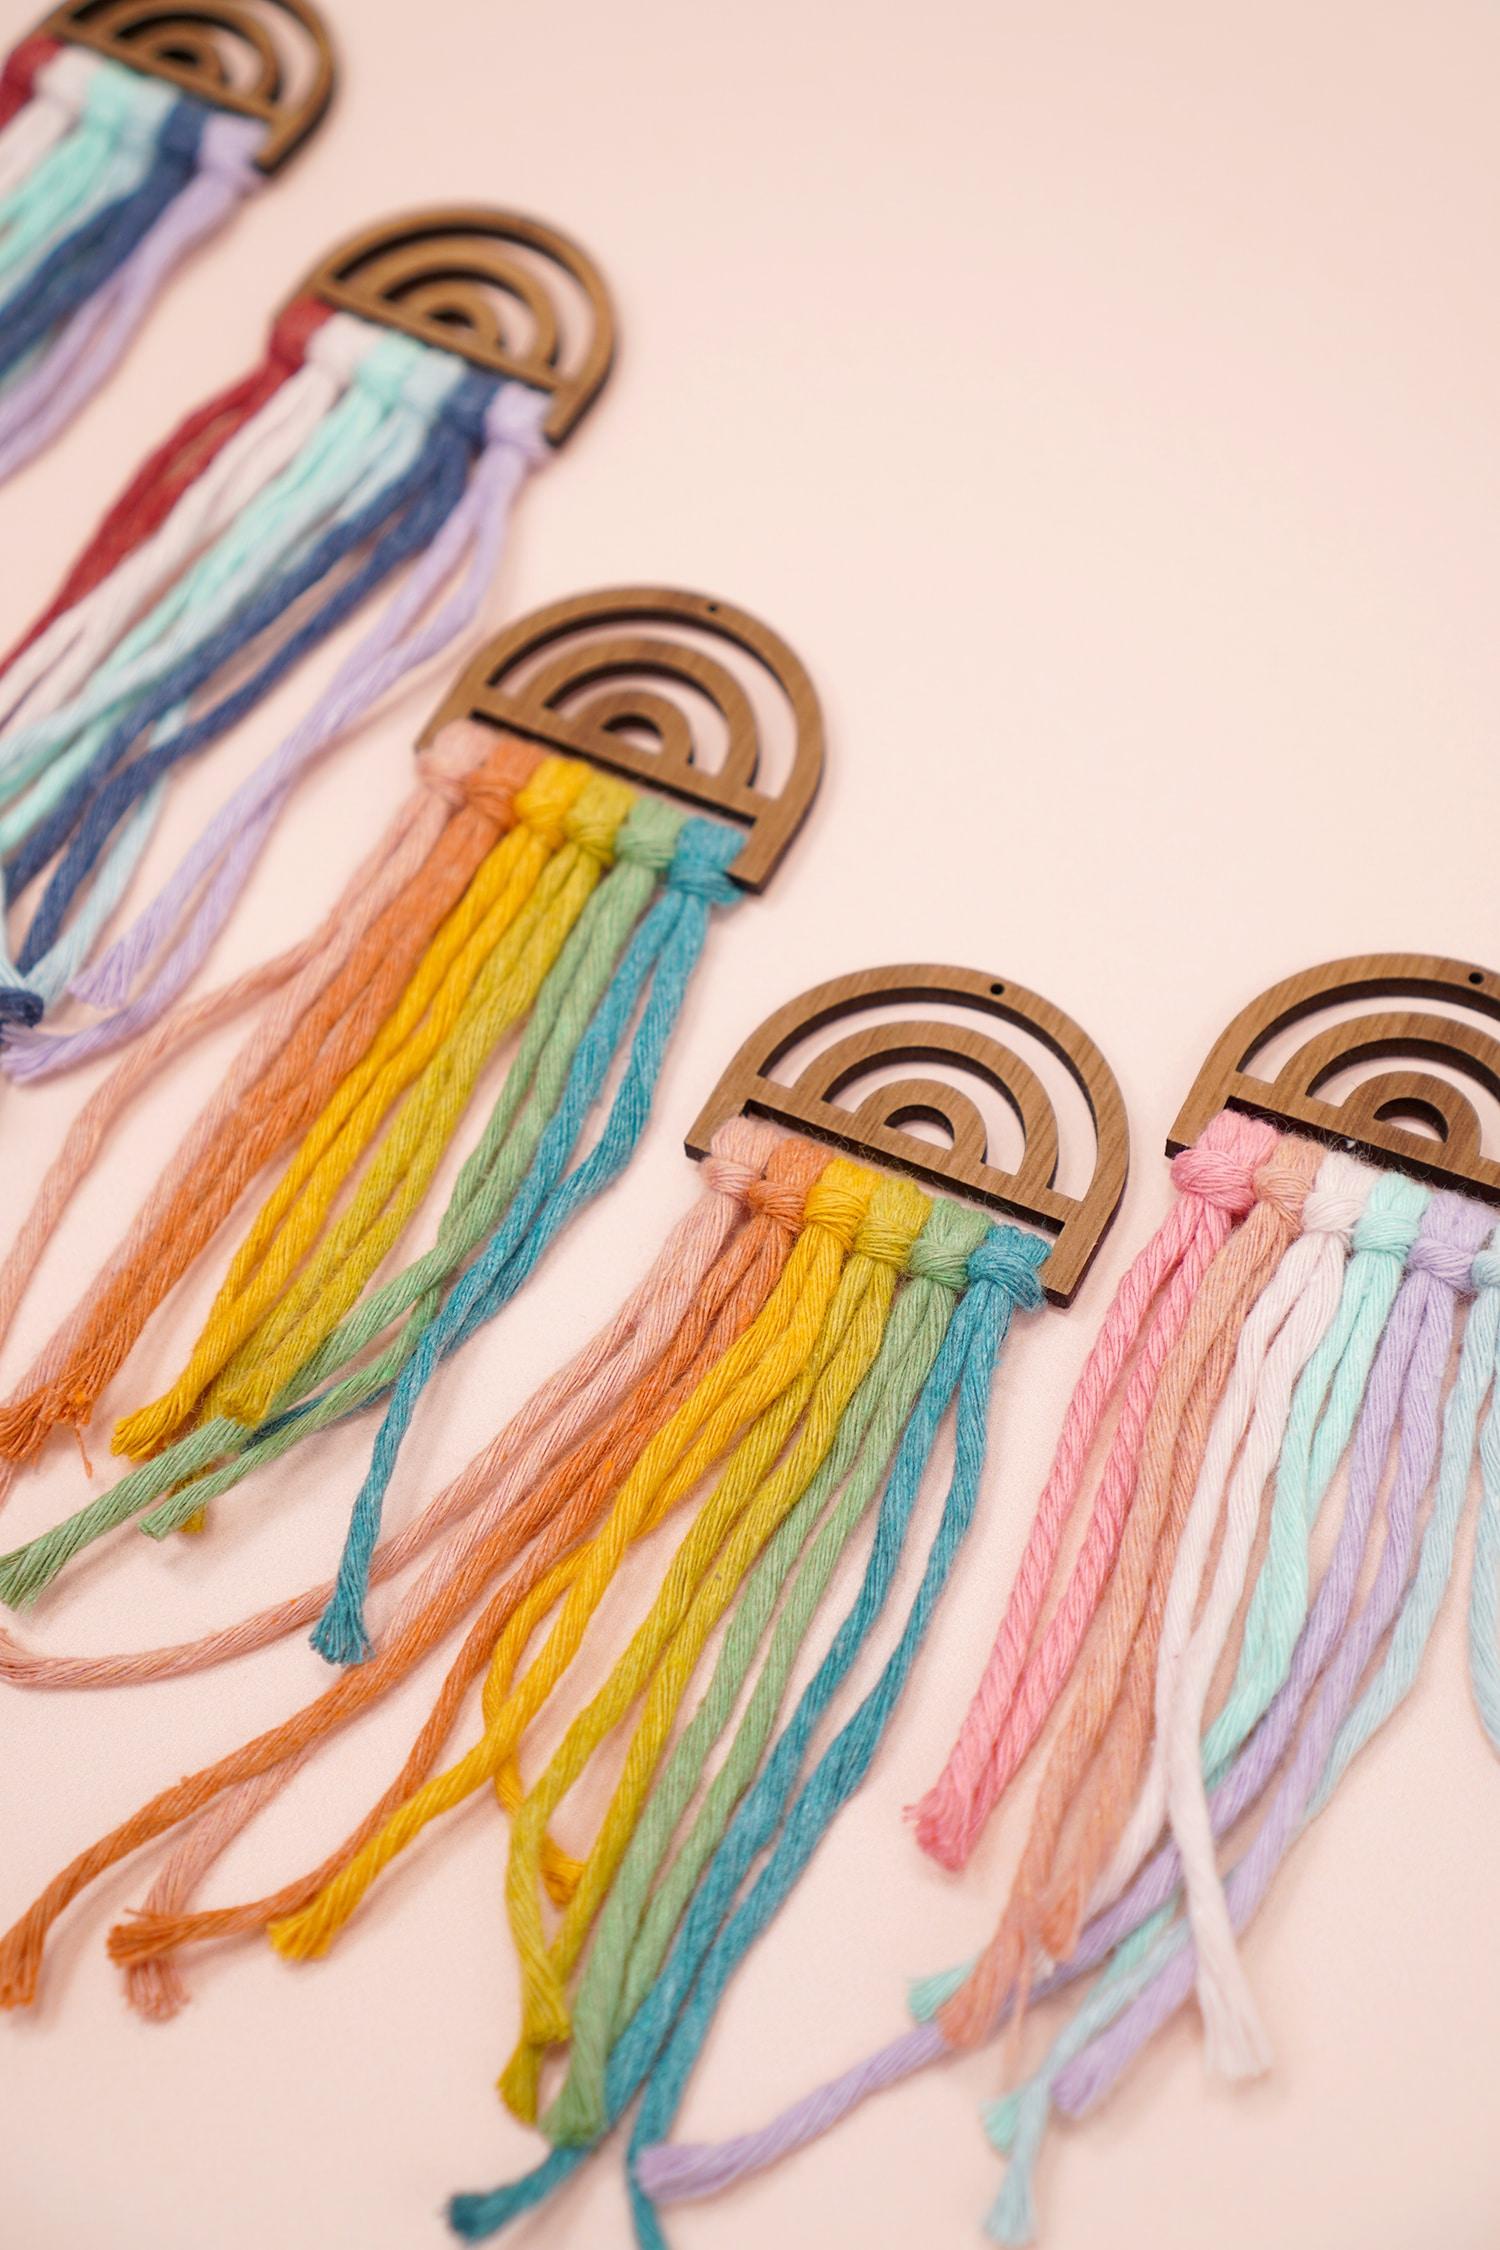 Assorted untrimmed rainbow macramé earrings on peach background